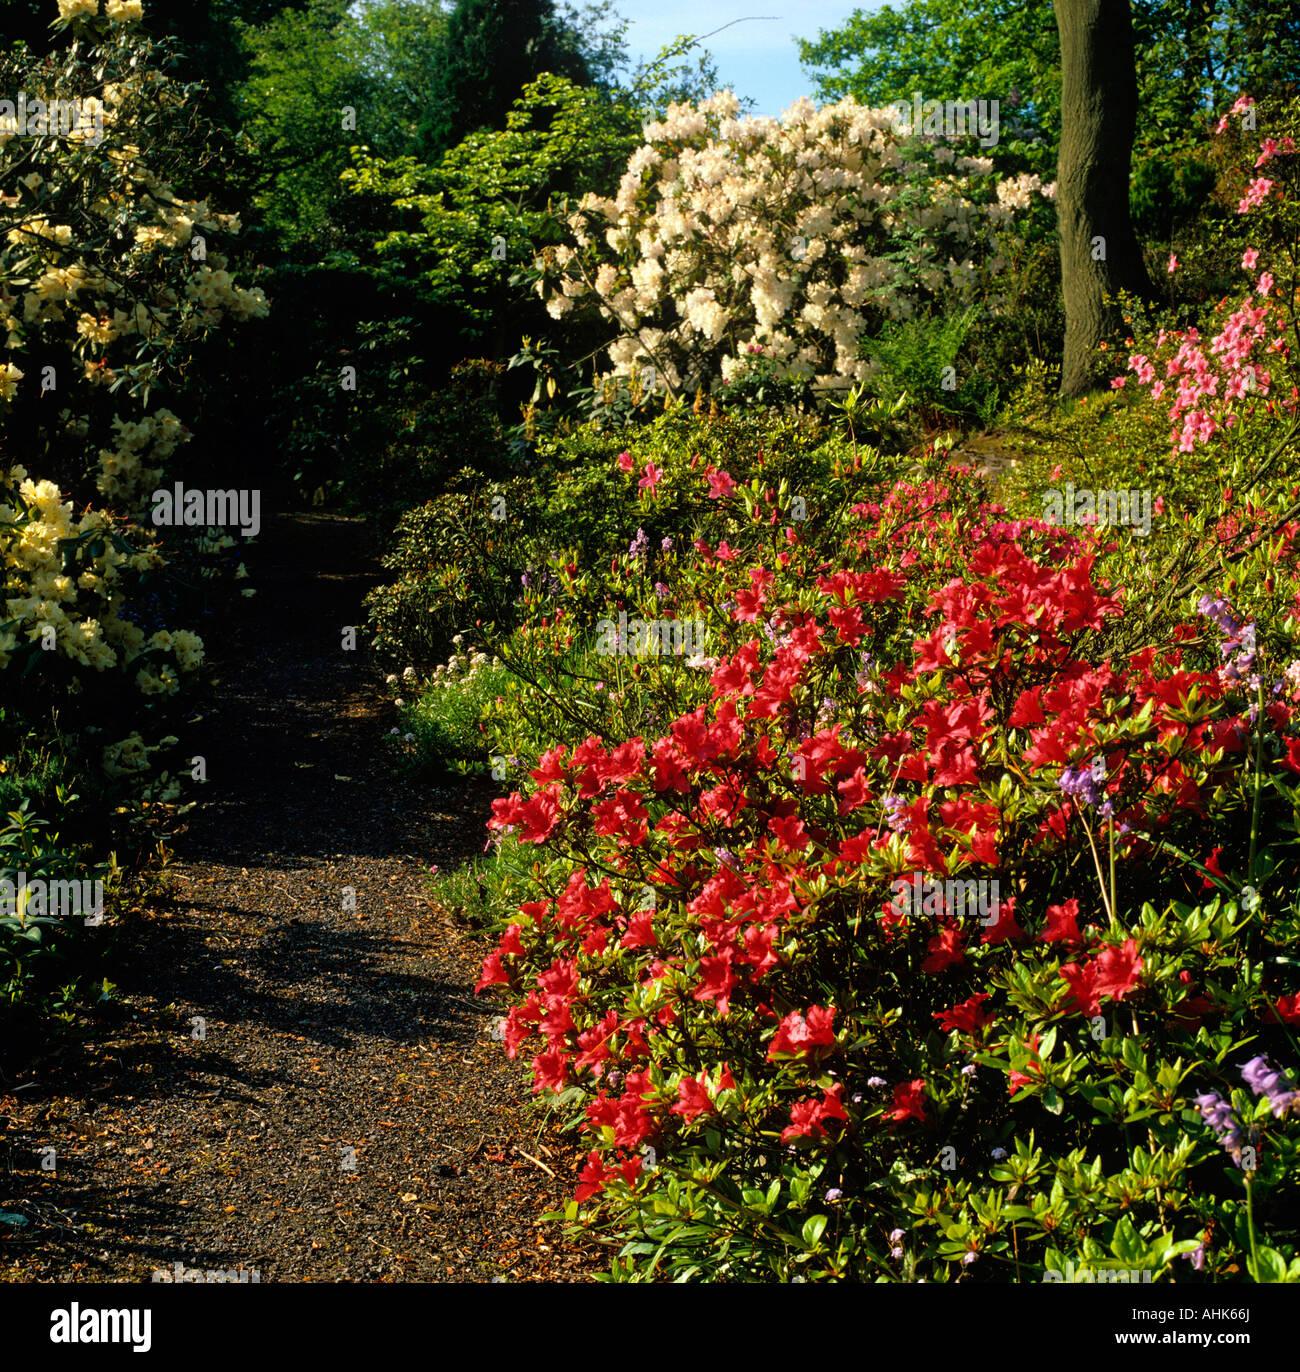 UK Cheshire Alderley Edge Rhododendron Azalea Garden Stock Photo ...